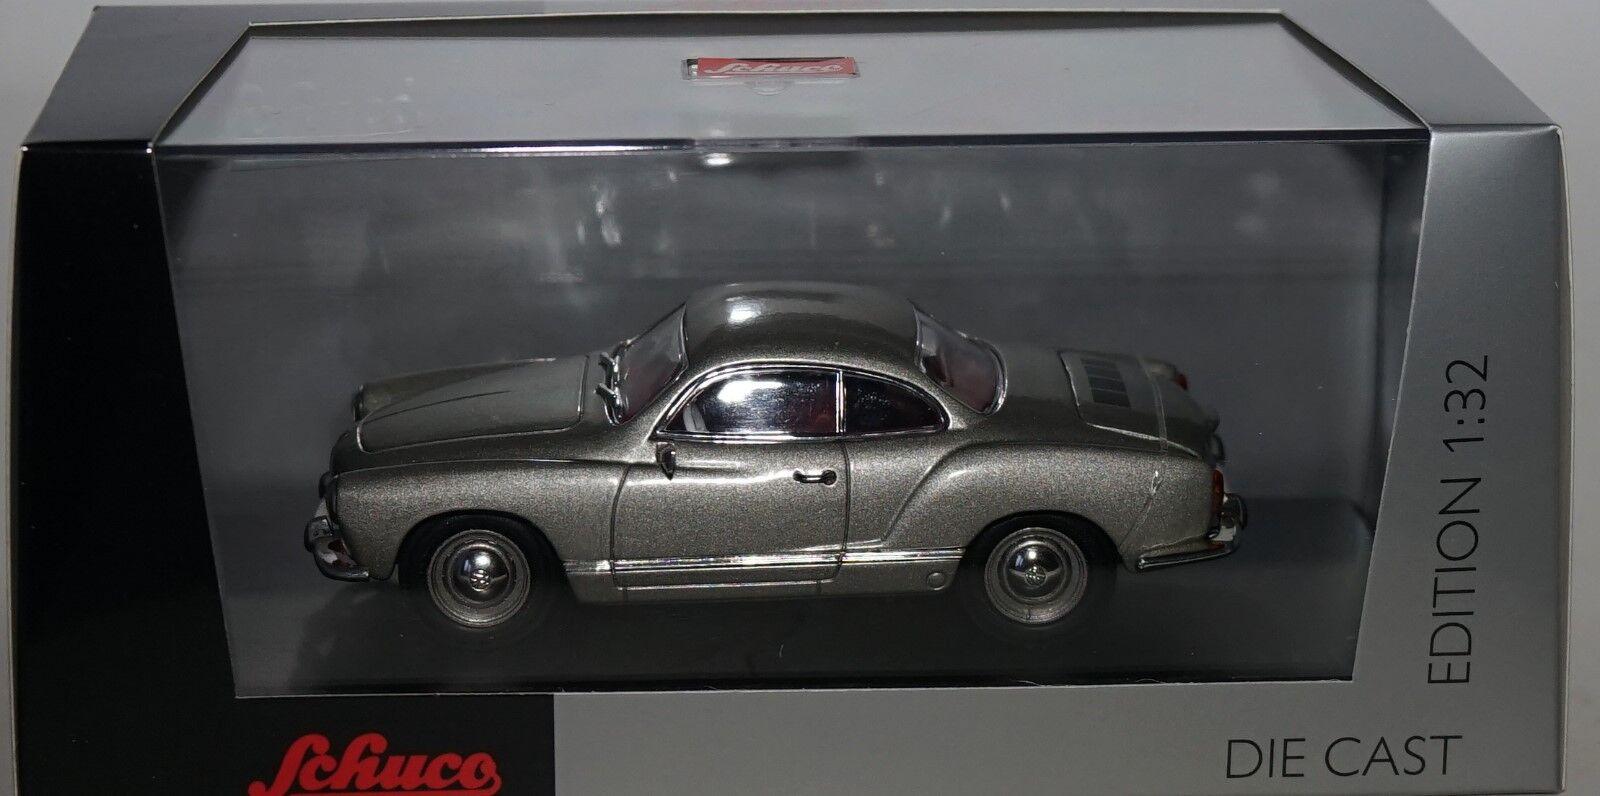 Schuco 0774600 Volkswagen Karmann Ghia in Argento 1:3 2 Scala Modello